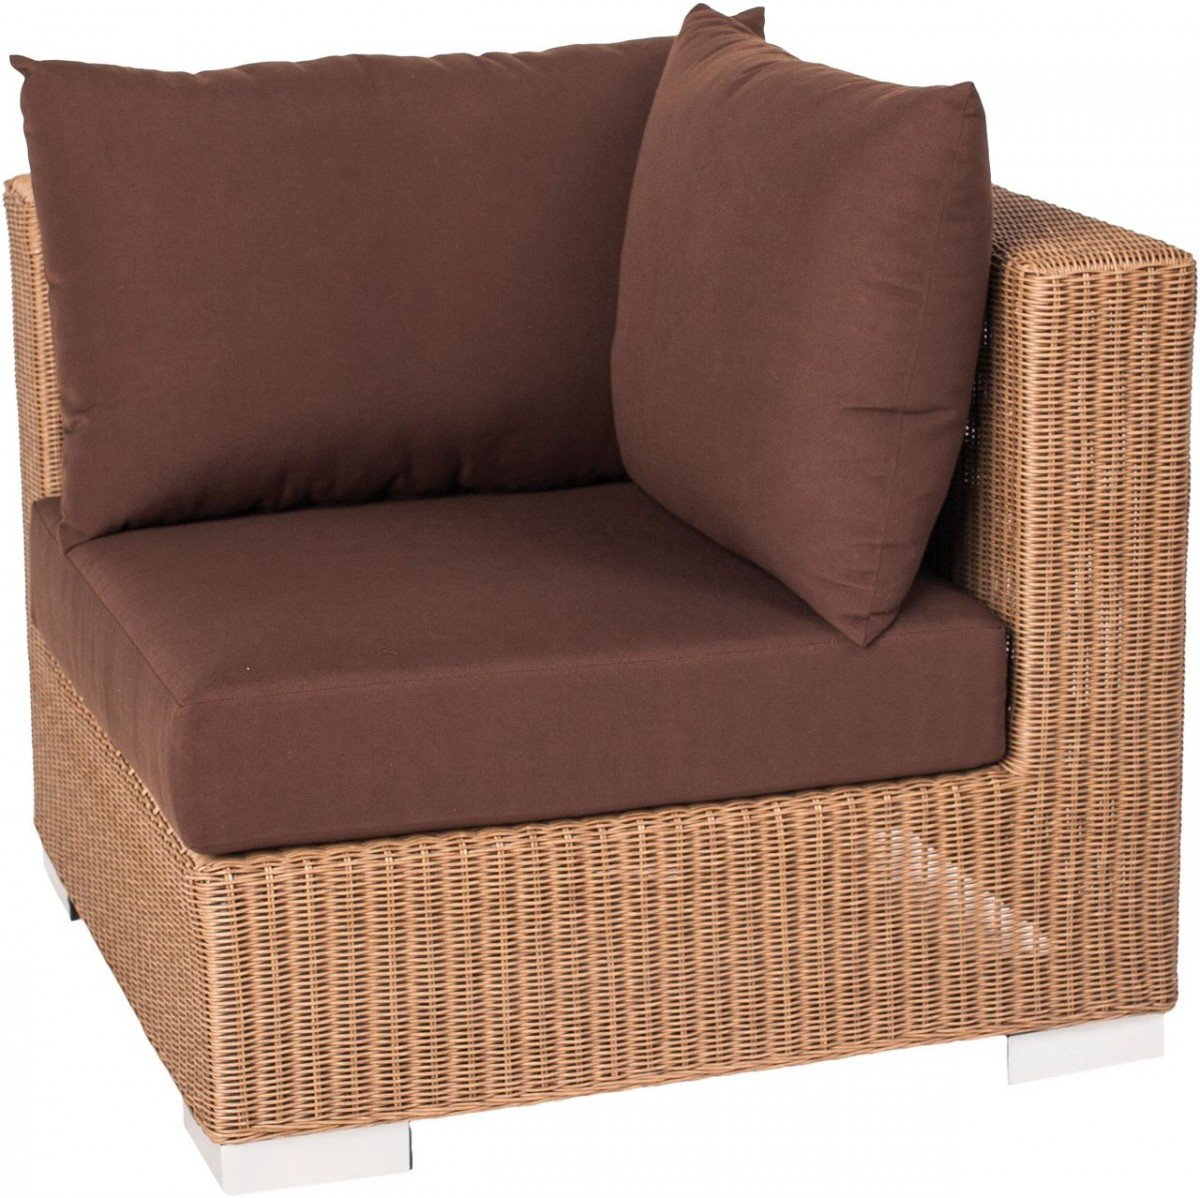 Dreams4Home Eckelement 'Marlo' – Sitz, Sofa, Stuhl, Eckelement, Terrassenmöbel, Loungemöbel, Cocktailmöbel, B/H/T: 78 x 65 x 78 cm, Gartenmöbel inklusive Kissen, Rattan, Aluminiumgestell, in braun jetzt bestellen